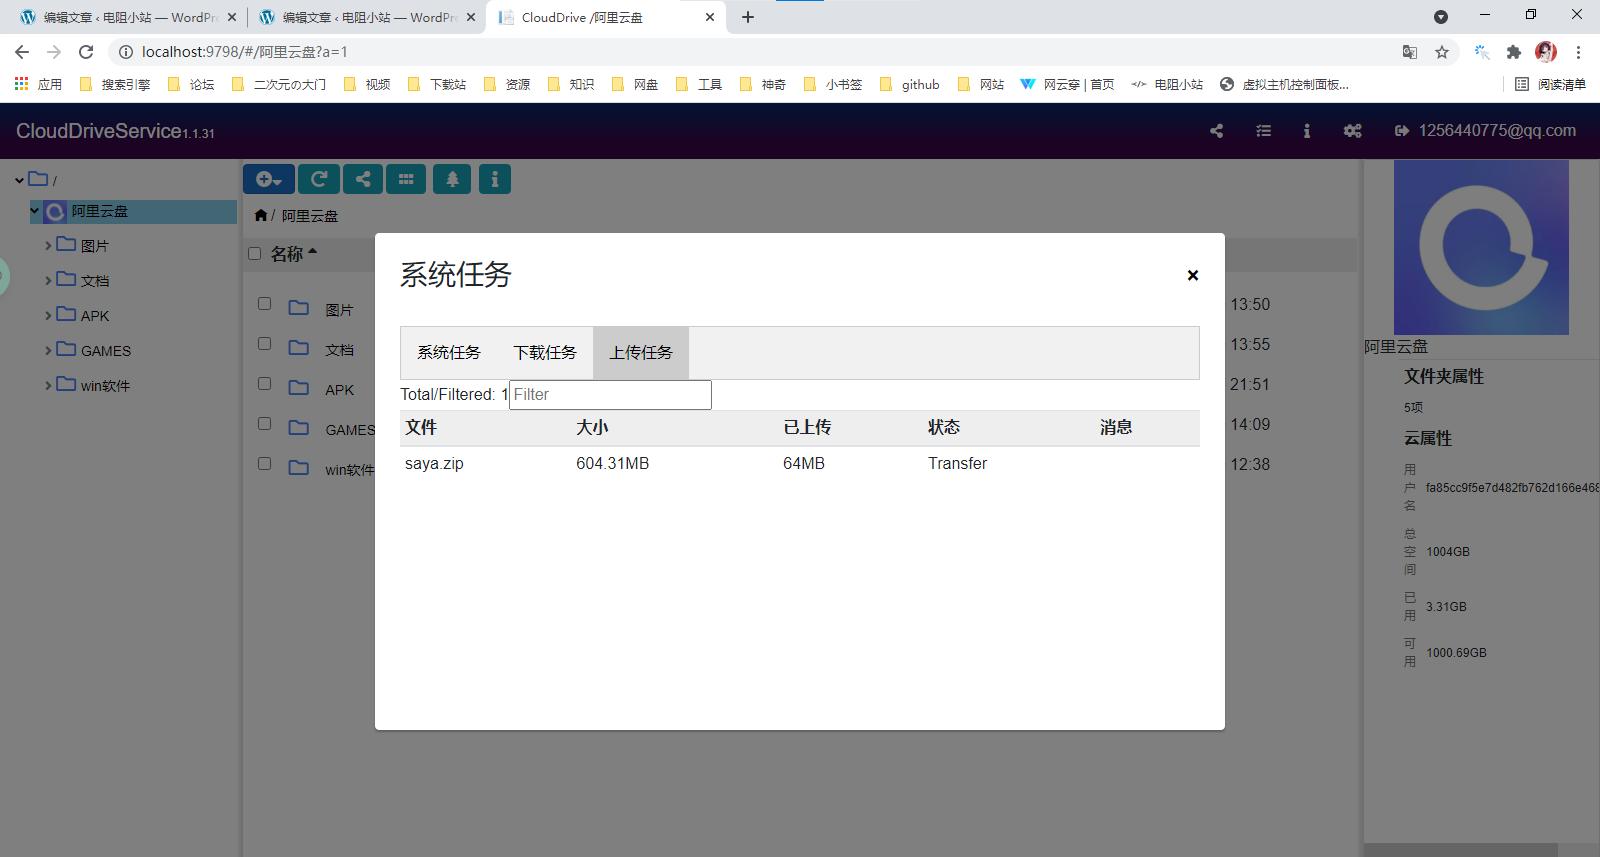 Screenshot%202021 08 03%20133423 - CloudDrive 把云盘作为虚拟硬盘